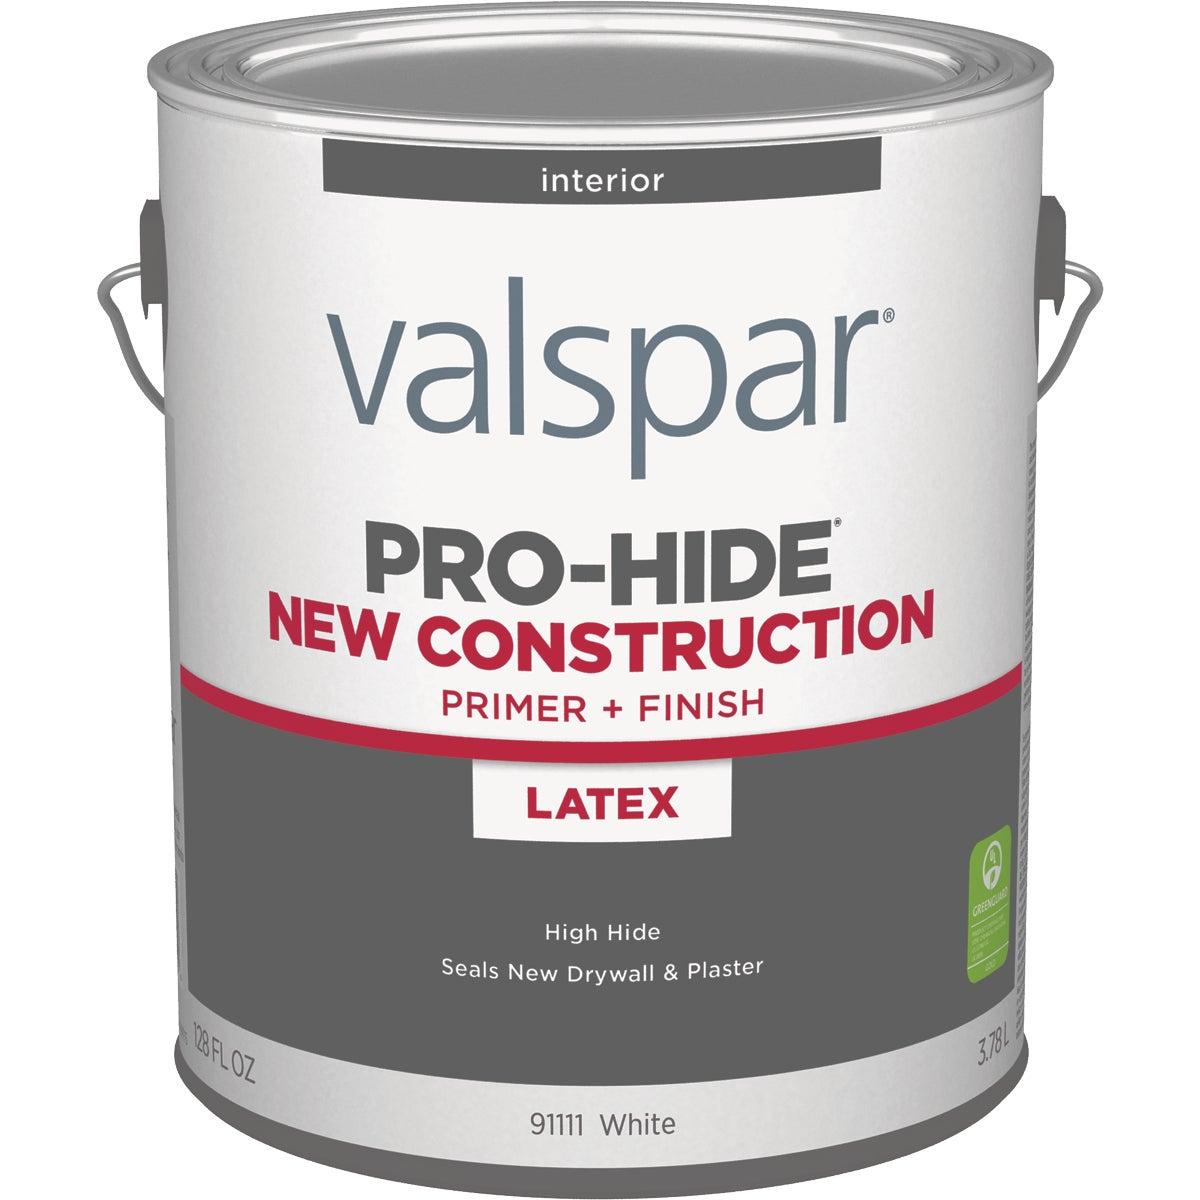 INT CONSTRUCTION PRIMER - 045.0011287.007 by Valspar Corp